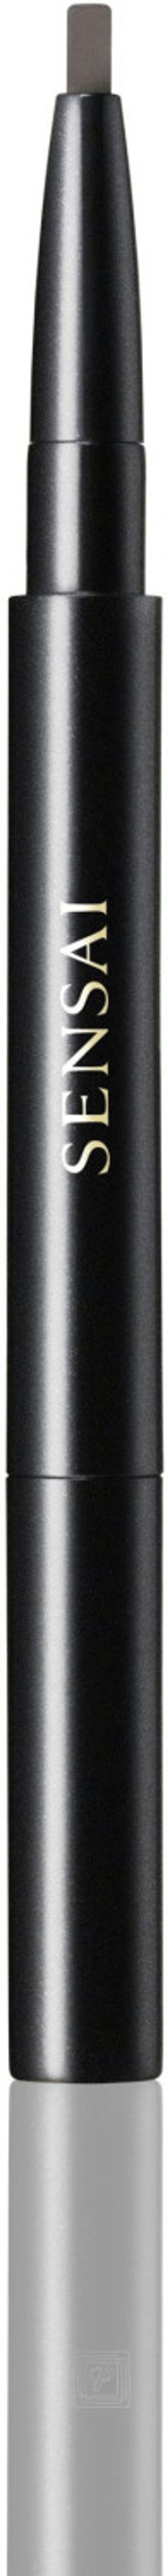 Kanebo Kanebo Sensai Colours Eyebrow Pencil